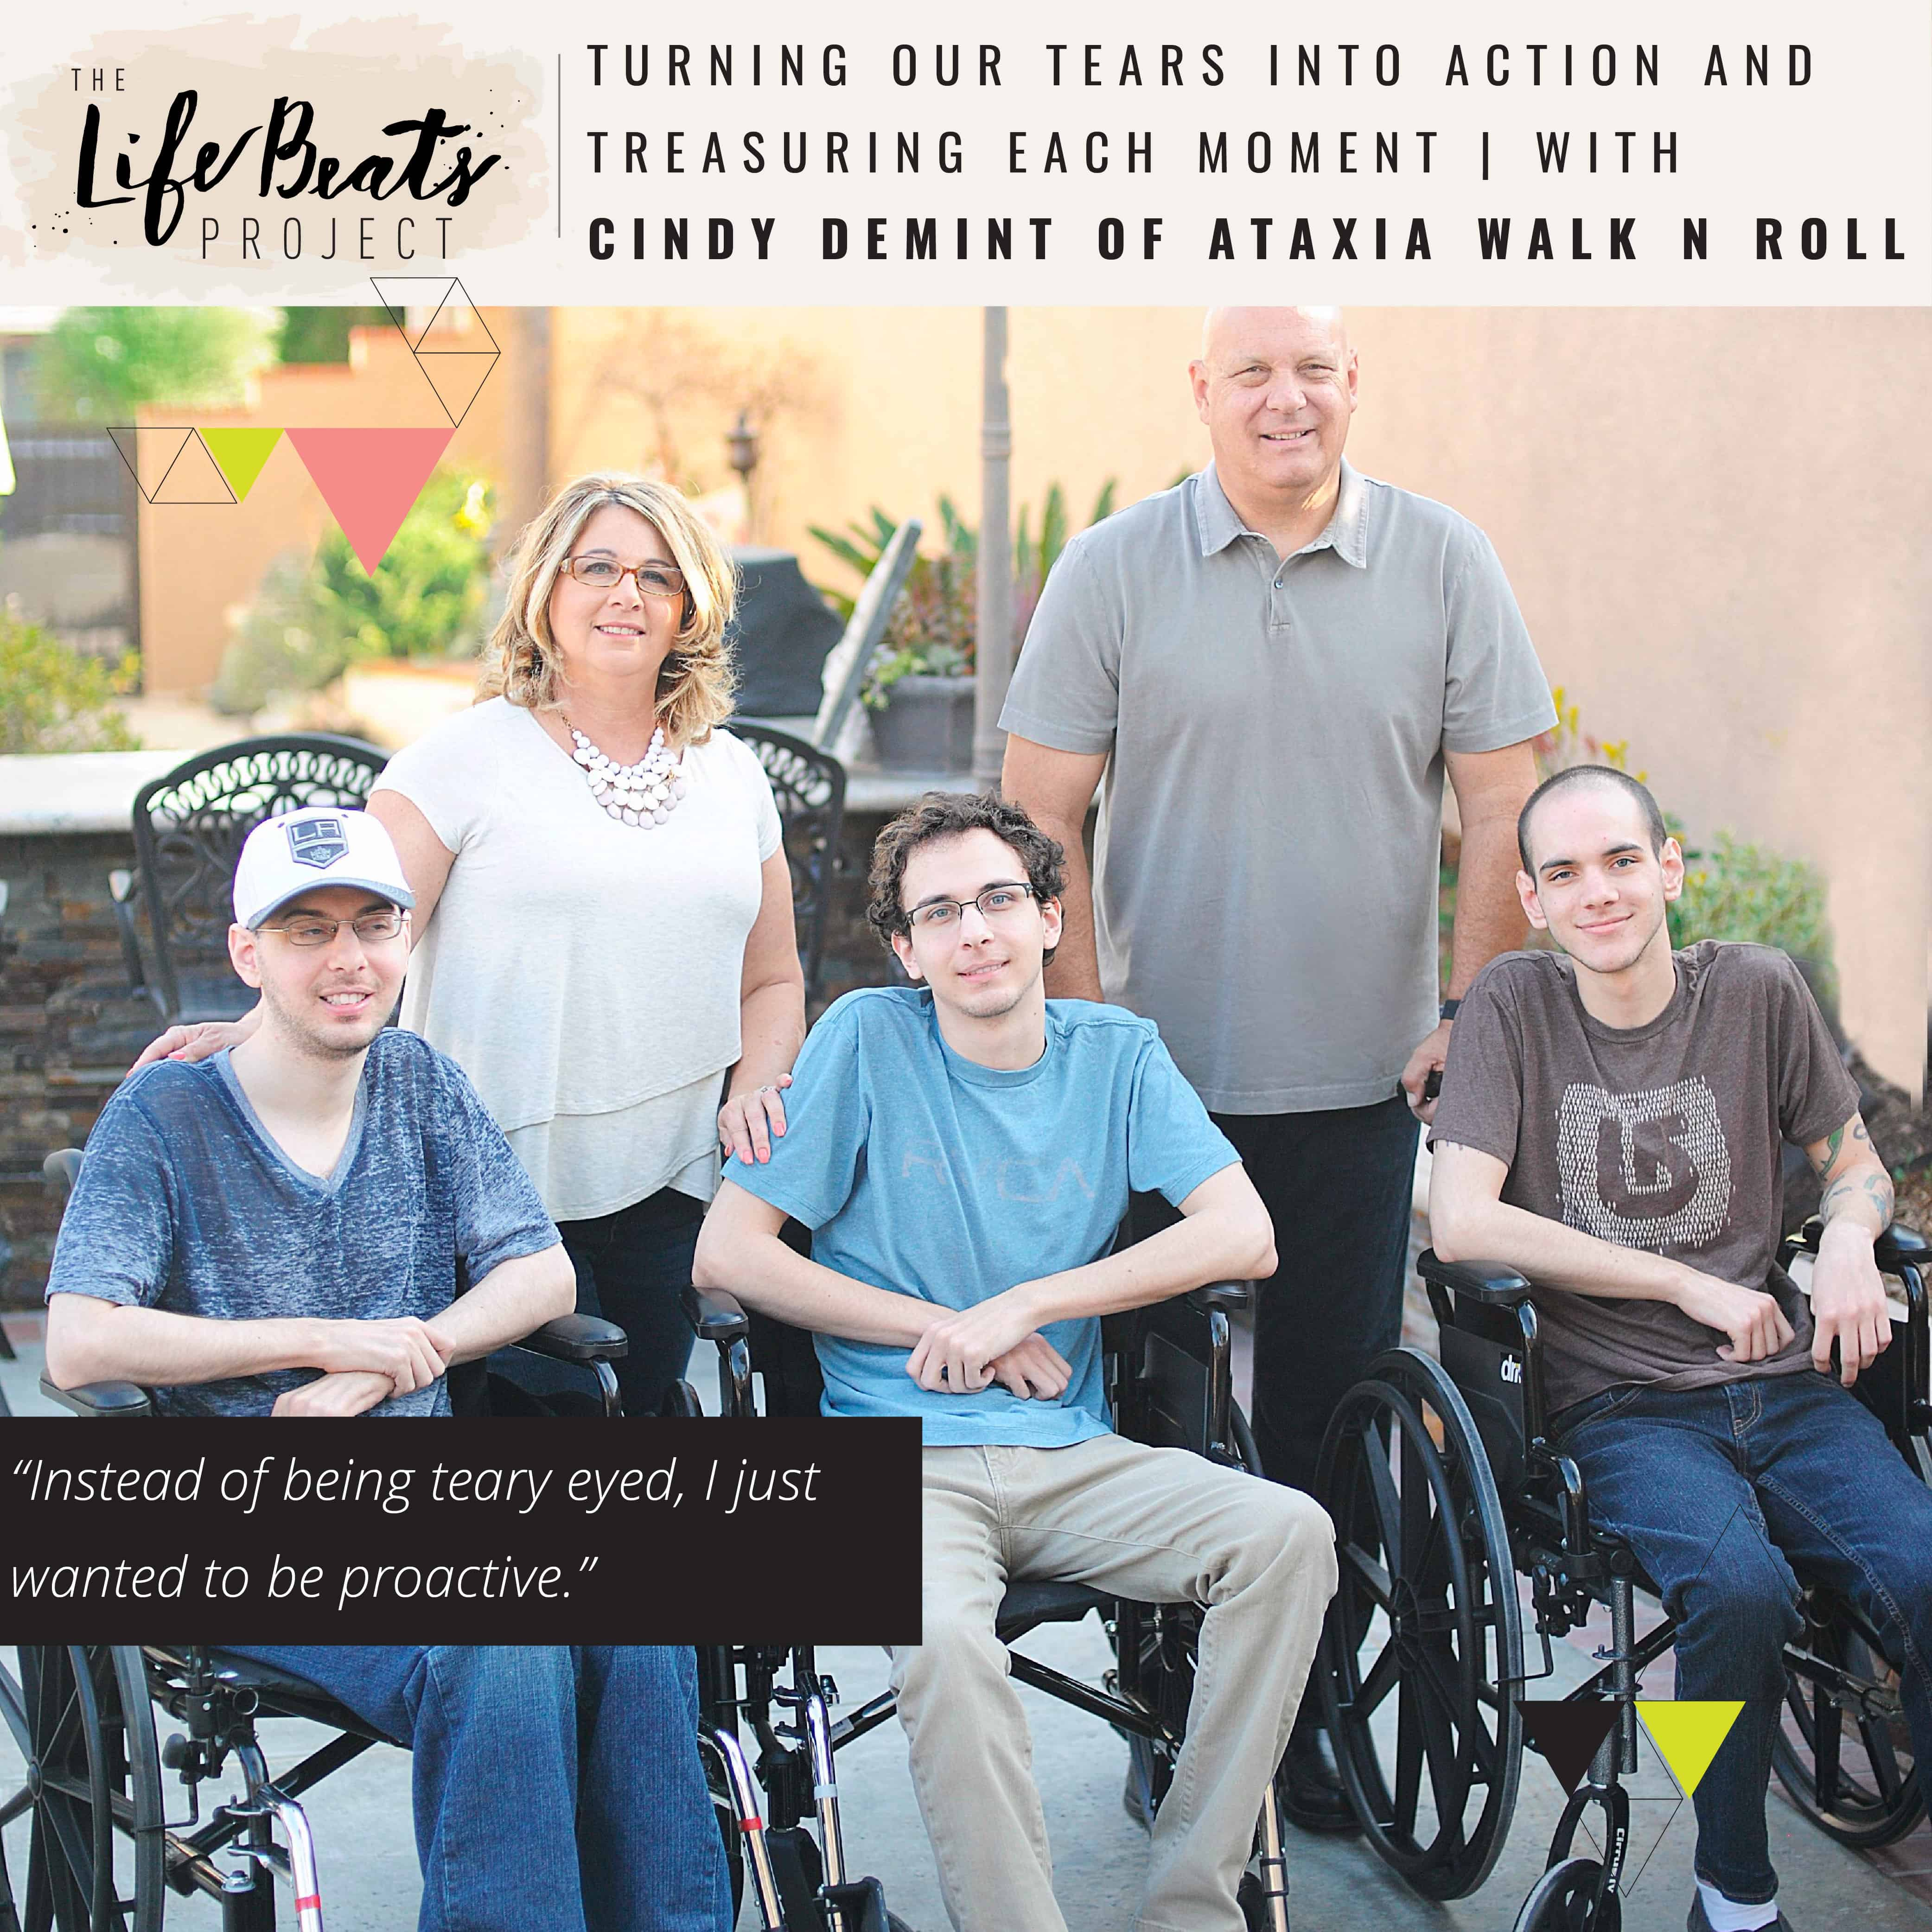 Ataxia neurological degenerative disease life in a wheelchair walk n roll child disabilities mother caregiver